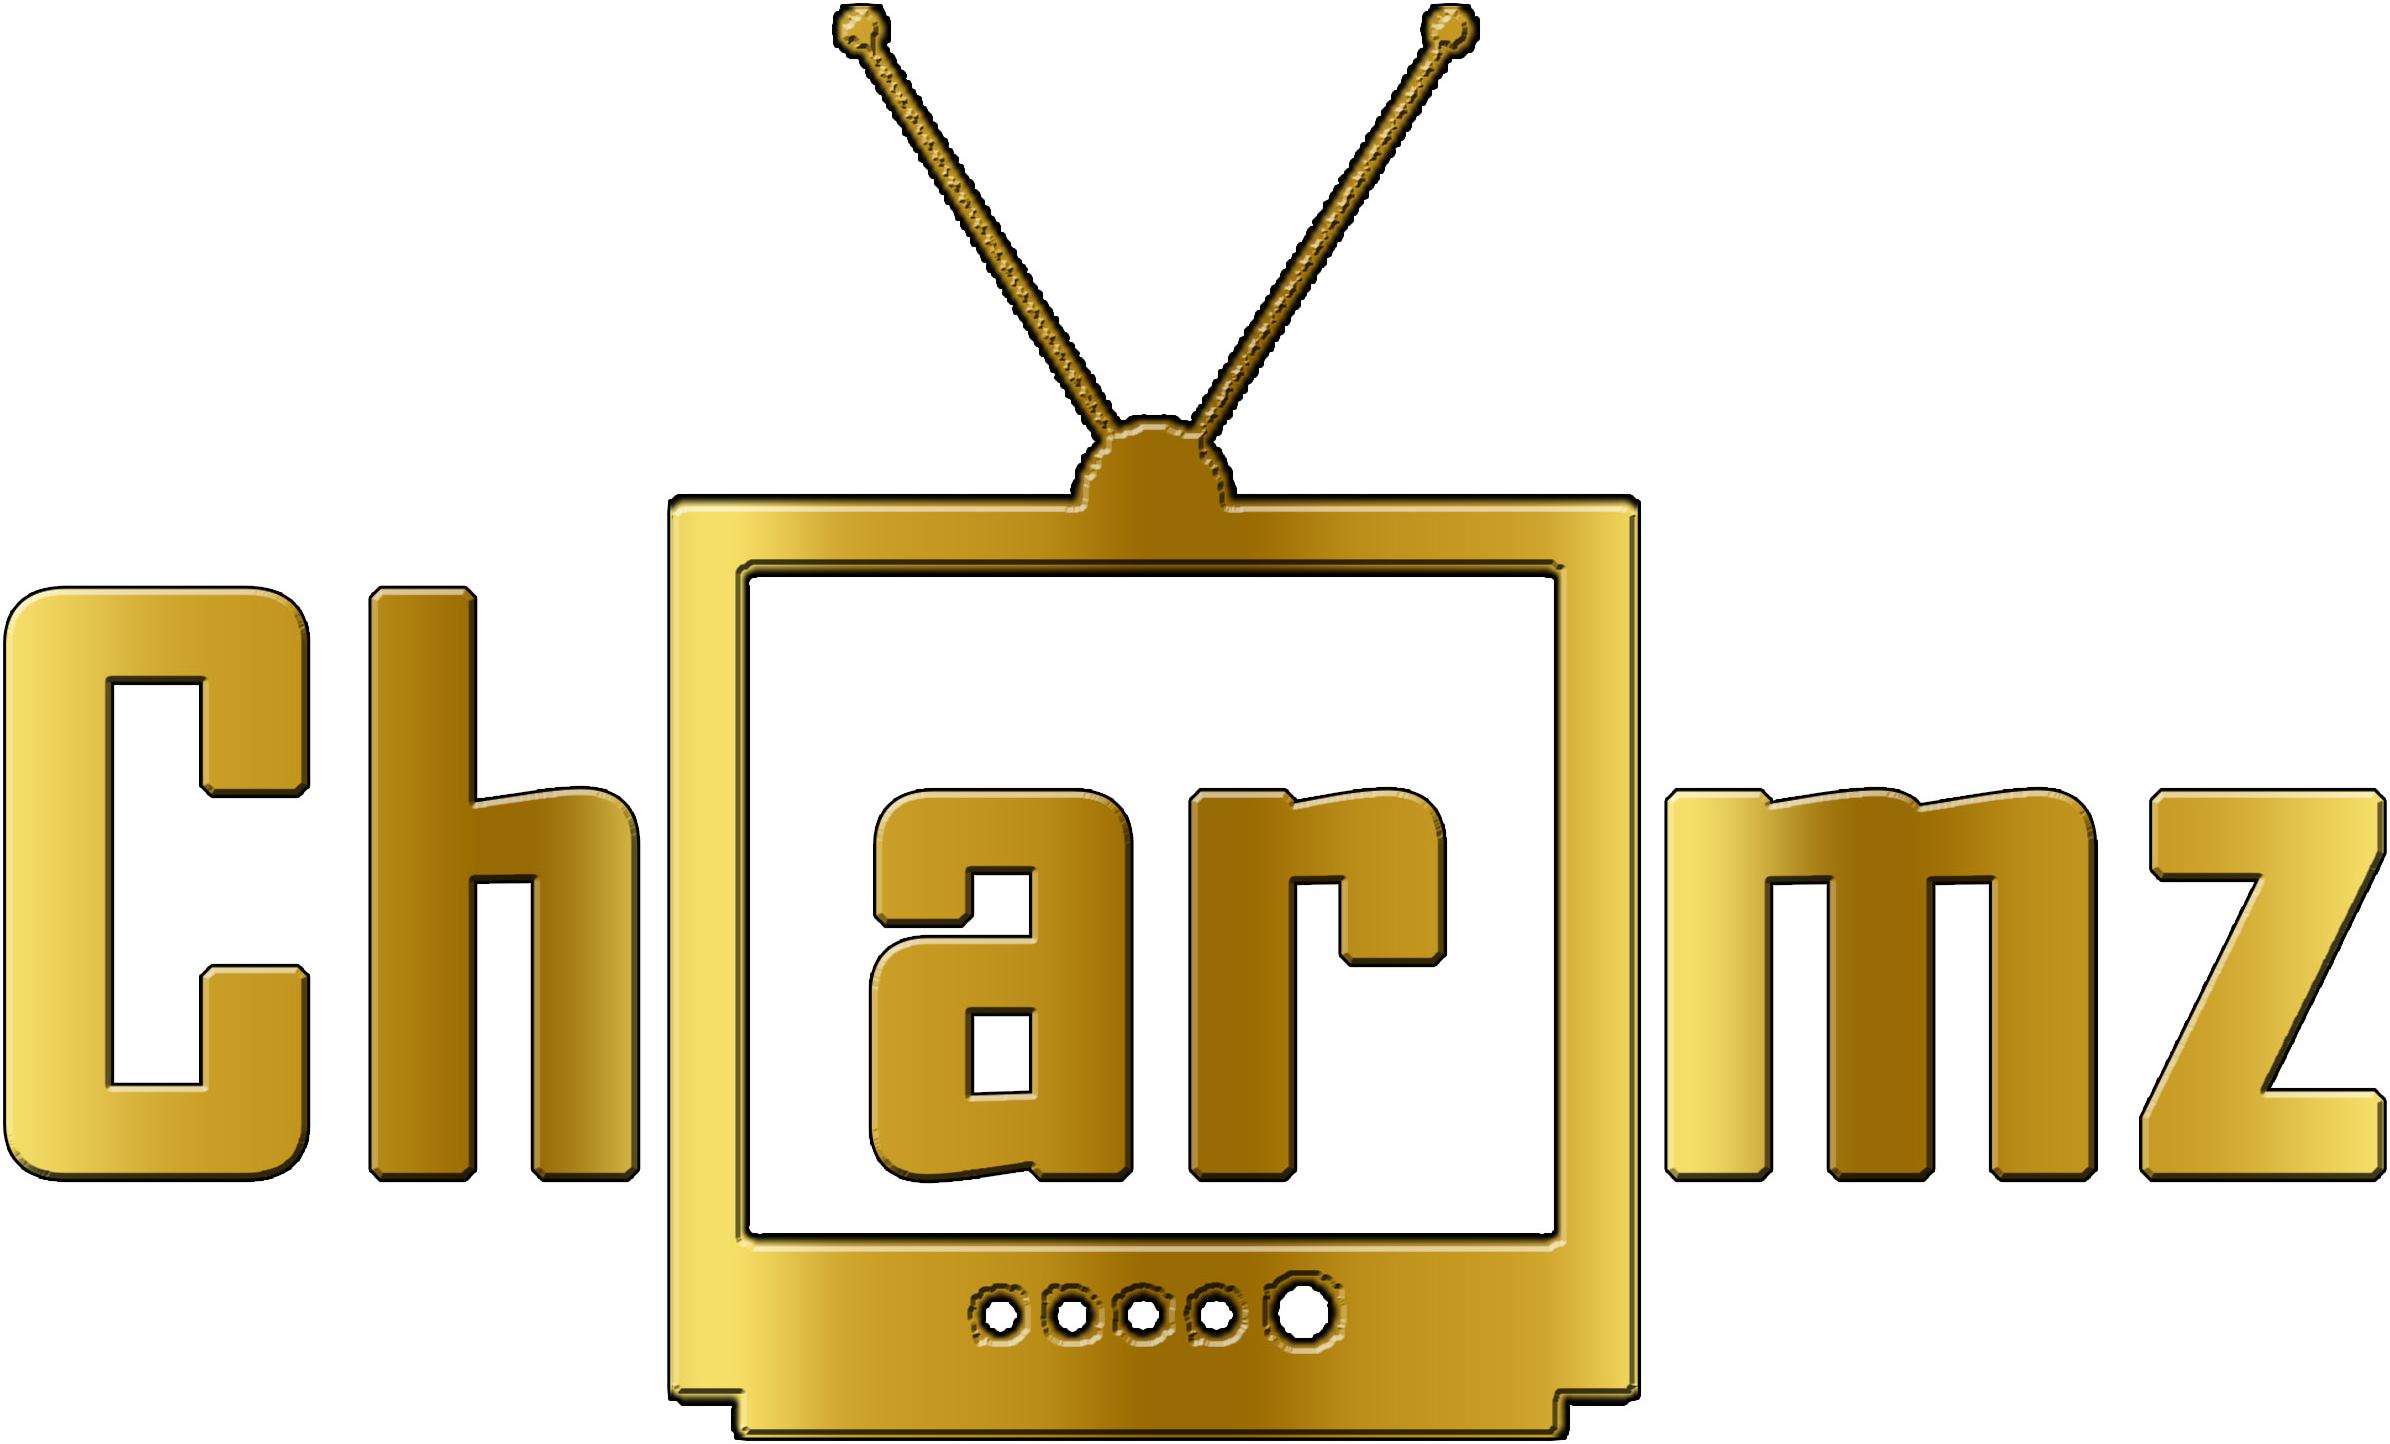 CharmzTV IPTV - TV of the Future